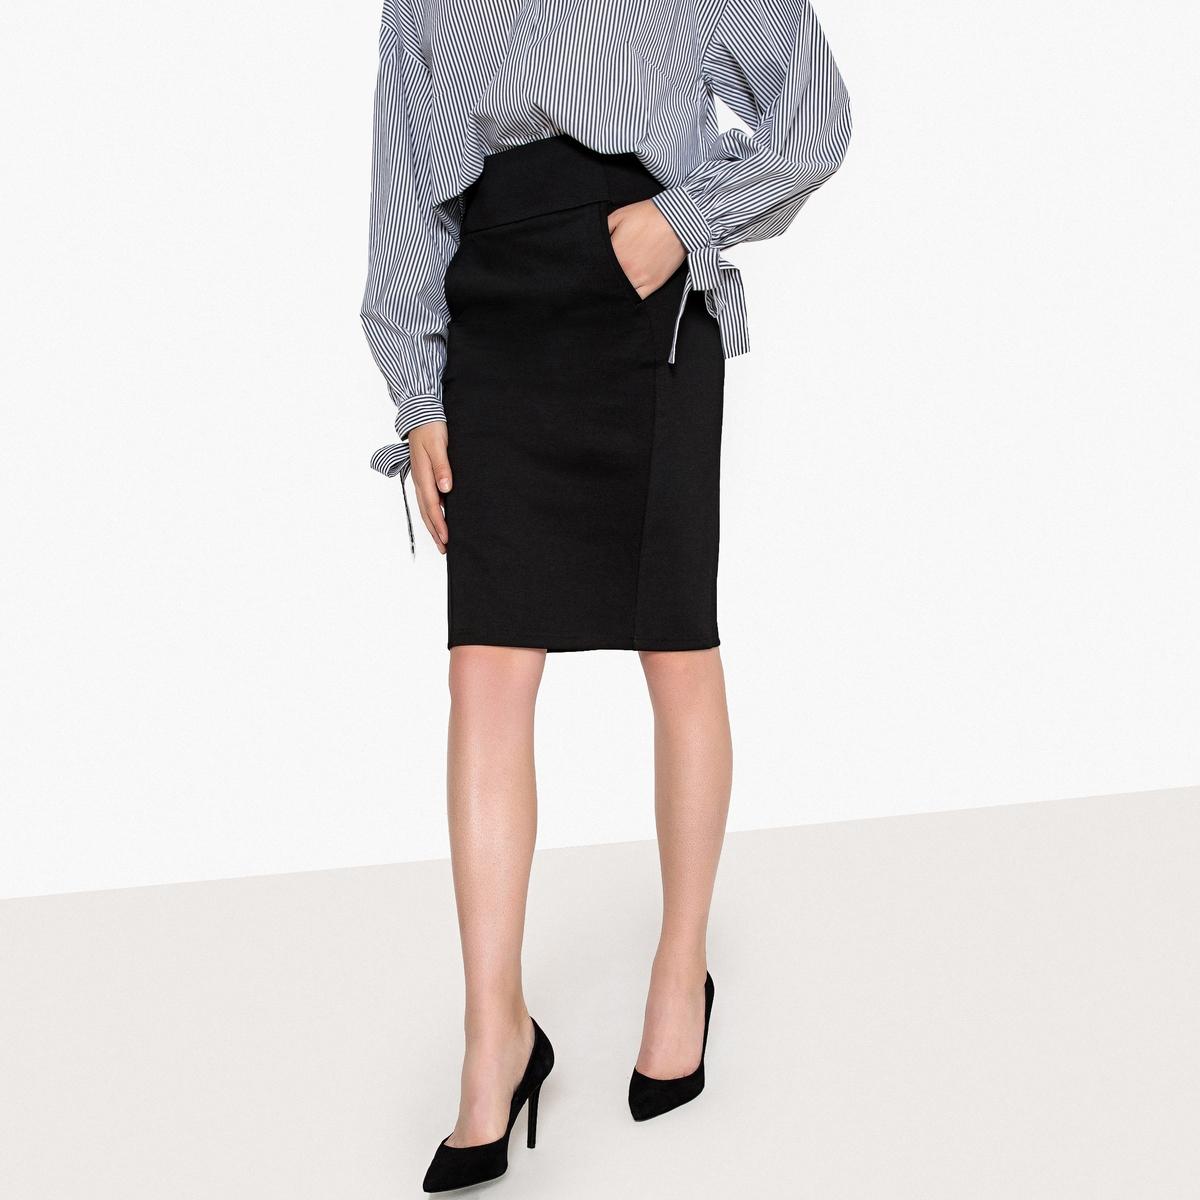 Юбка-карандаш из плотного трикотажа printio юбка карандаш укороченная